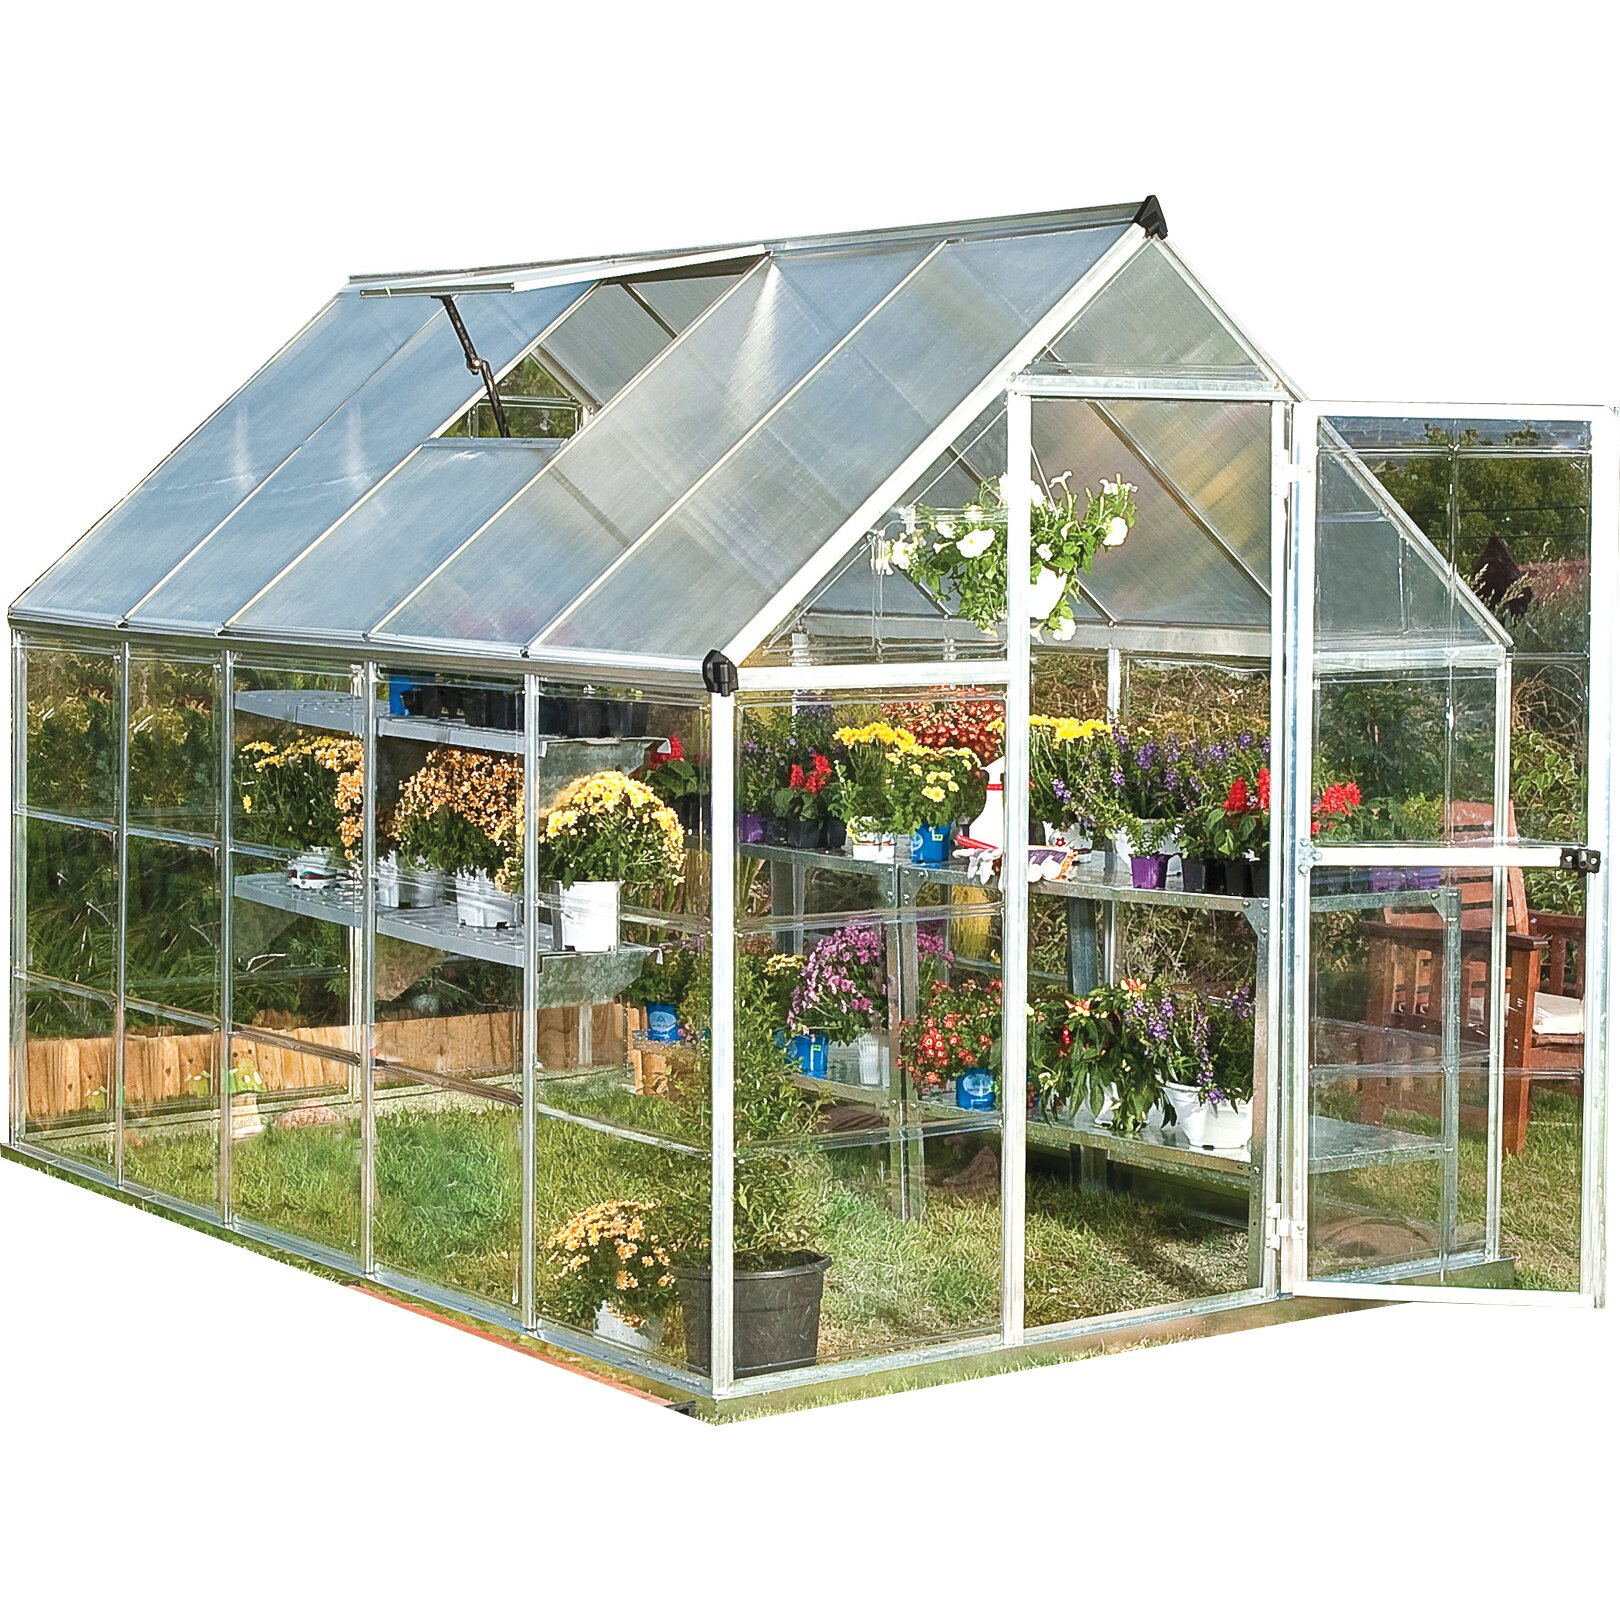 Hybrid 6 Ft. W X 10 Ft. D Cold Frame Greenhouse